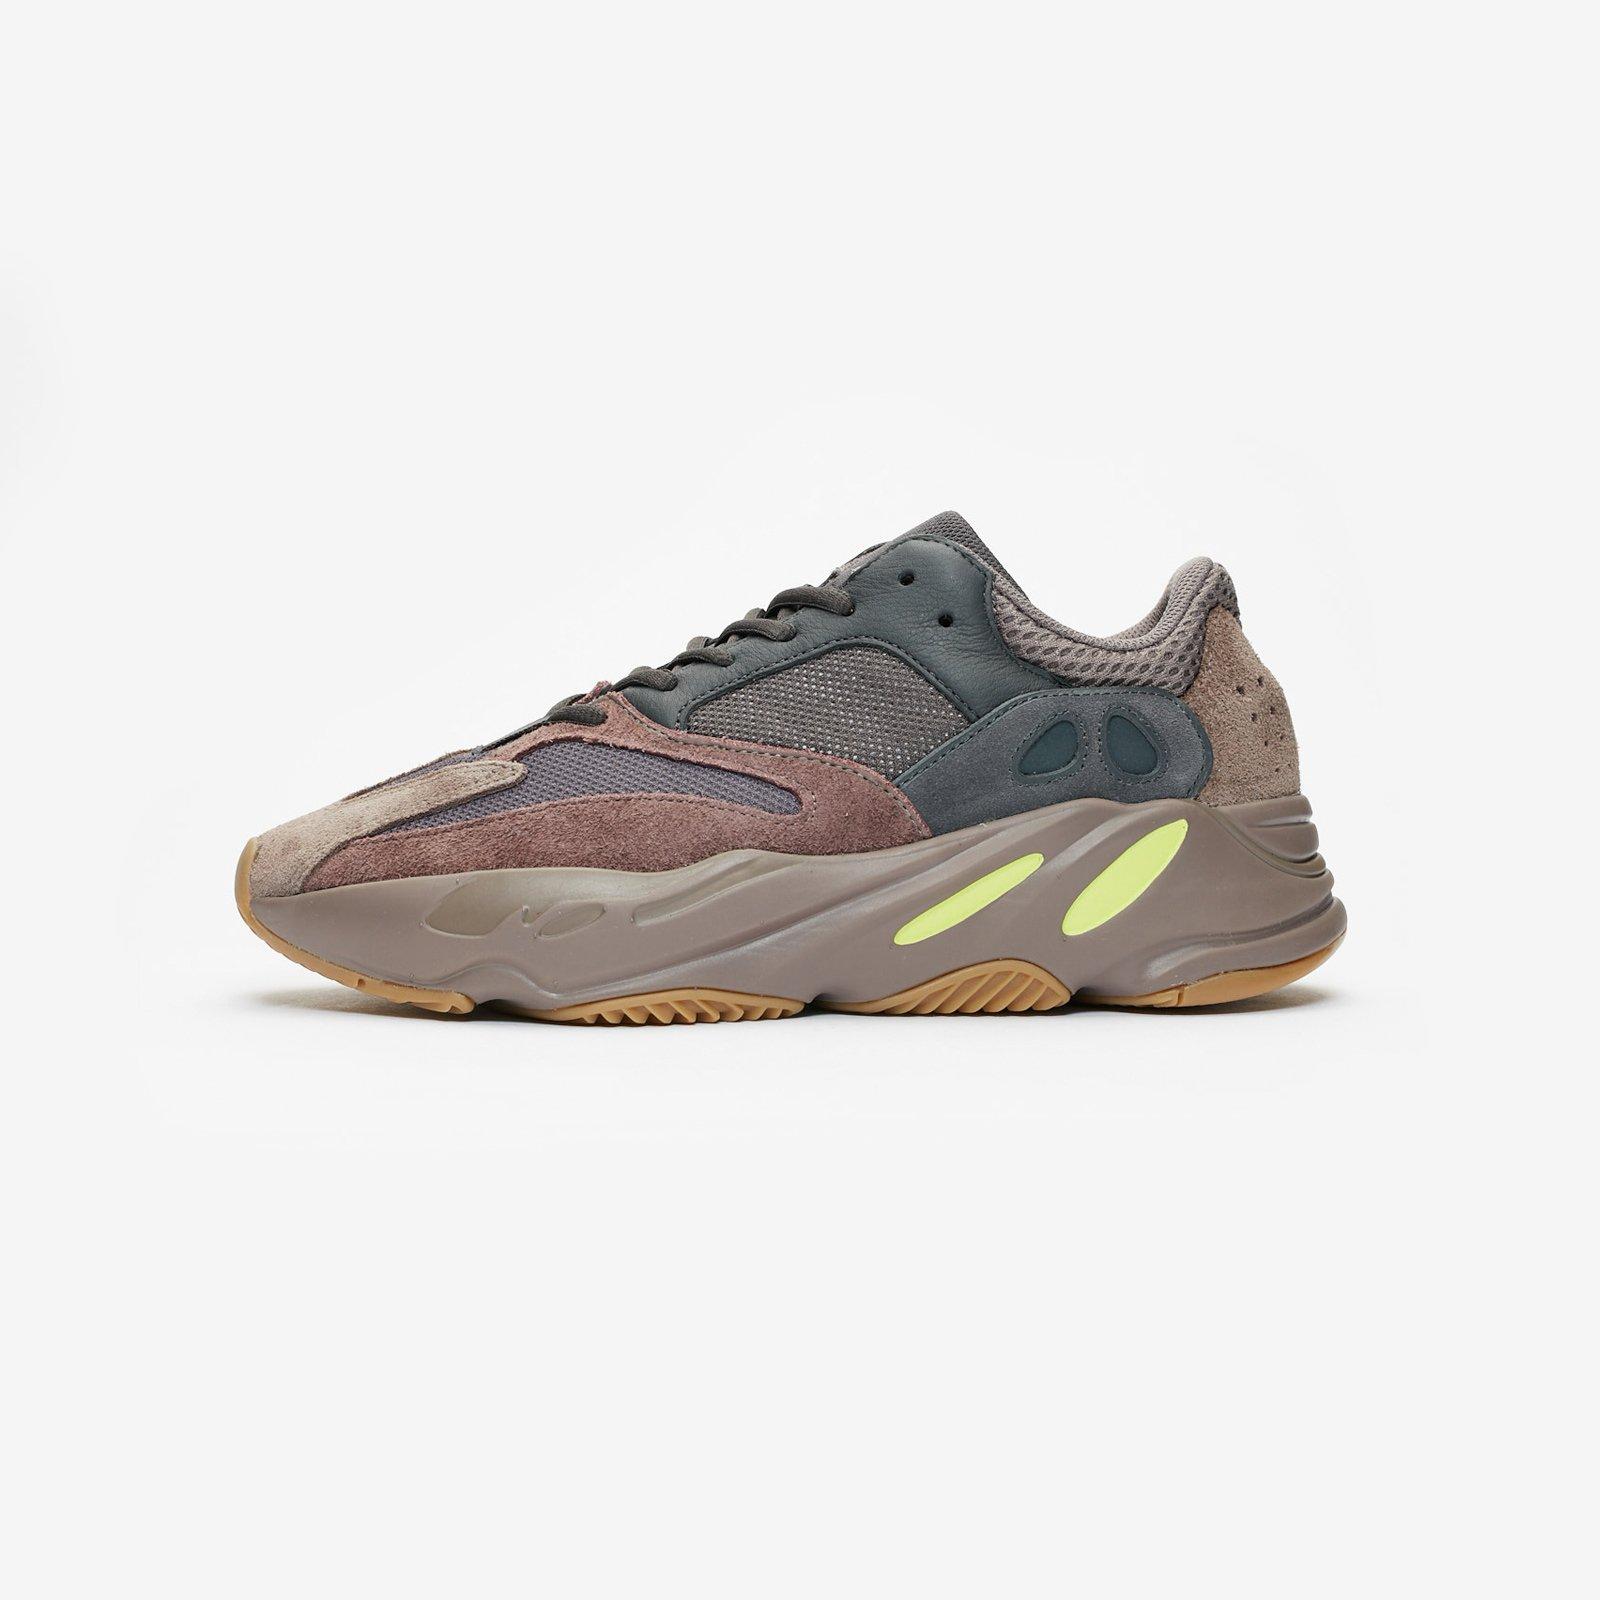 44ef8417ea903 adidas YEEZY BOOST 700 - Ee9614 - Sneakersnstuff